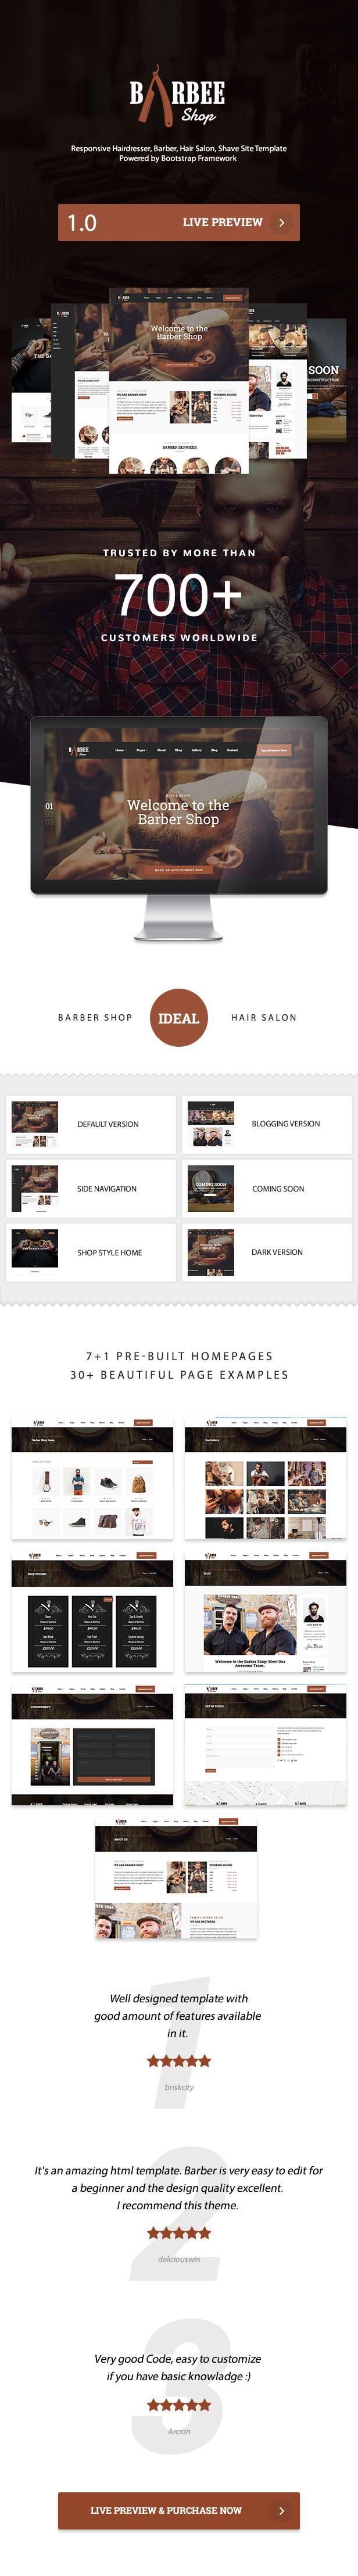 Barbee   Responsive Barber Shop & Hair Salon WordPress Theme - 3